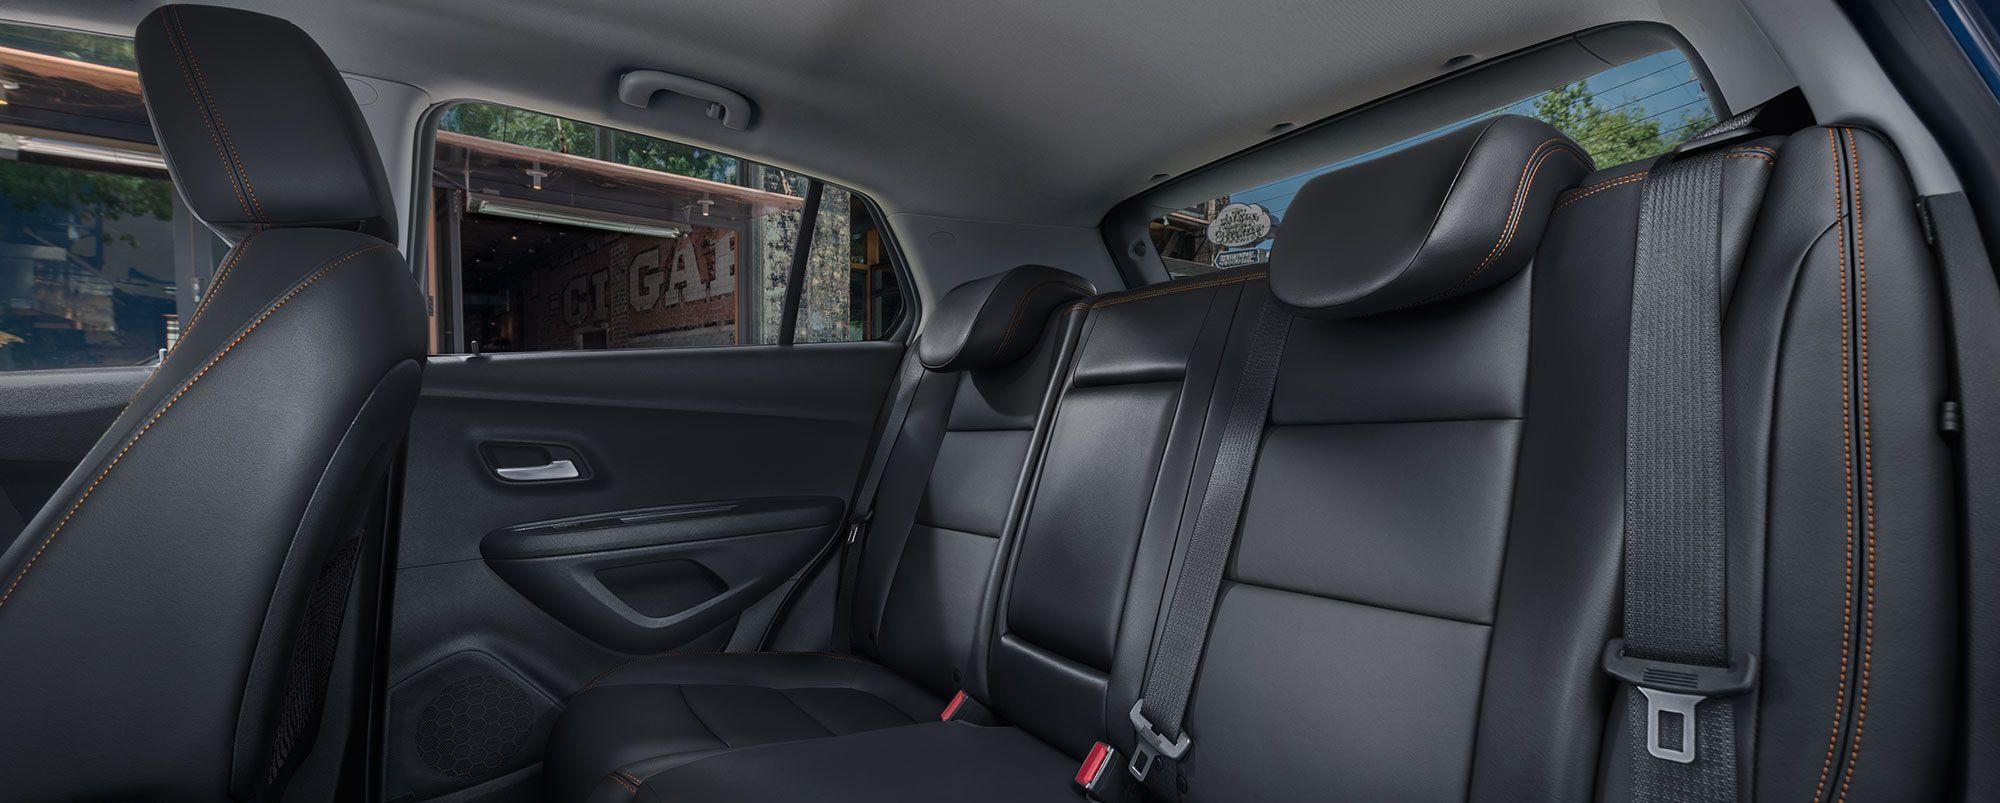 Comfortable and Stylish Seating Options!